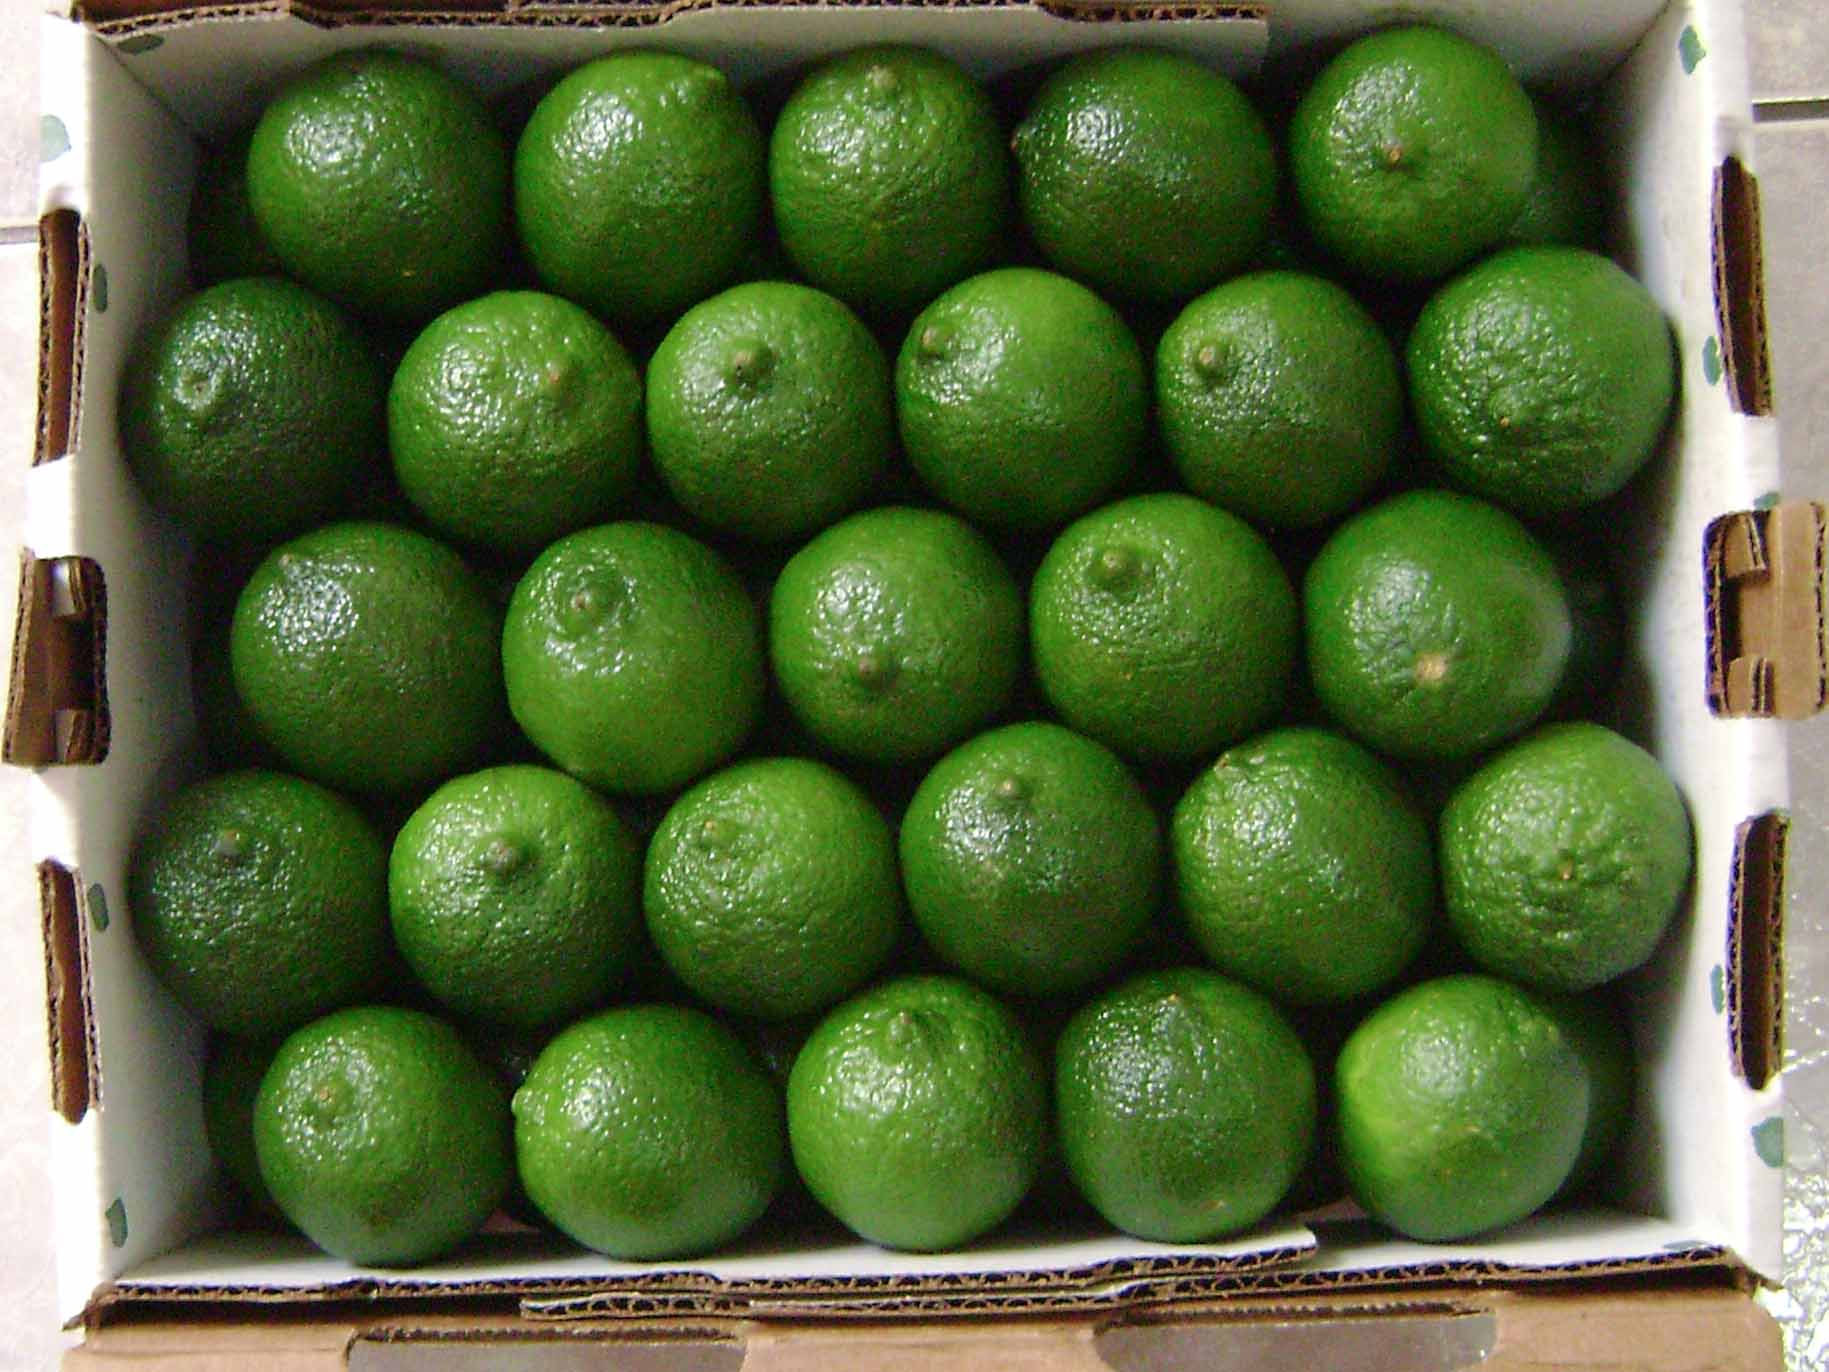 Seedless Lemon with best price